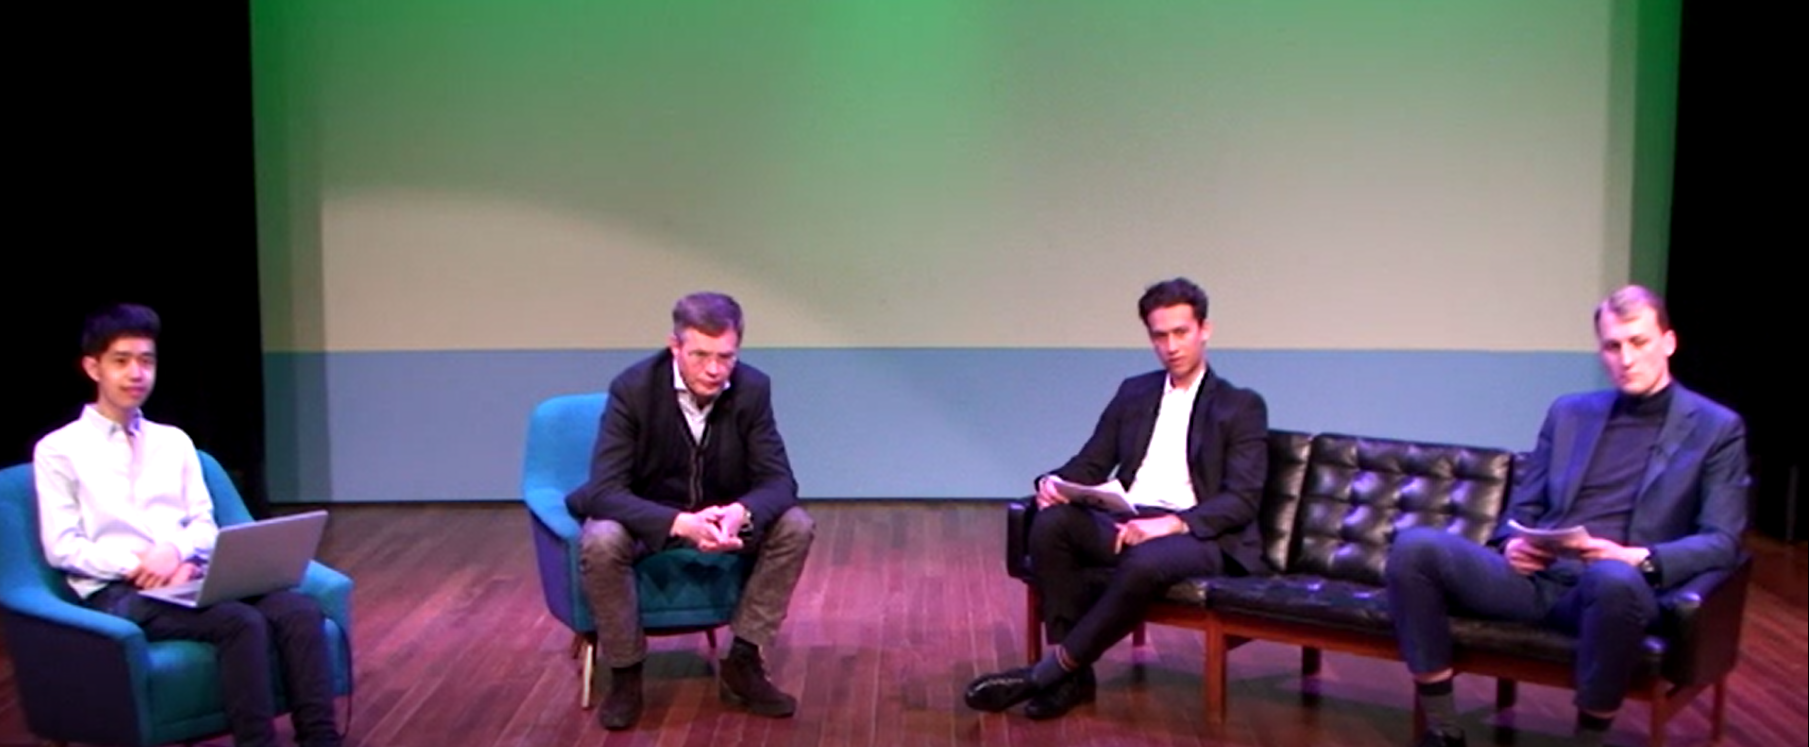 Digitale College Tour met Jan Peter Balkenende